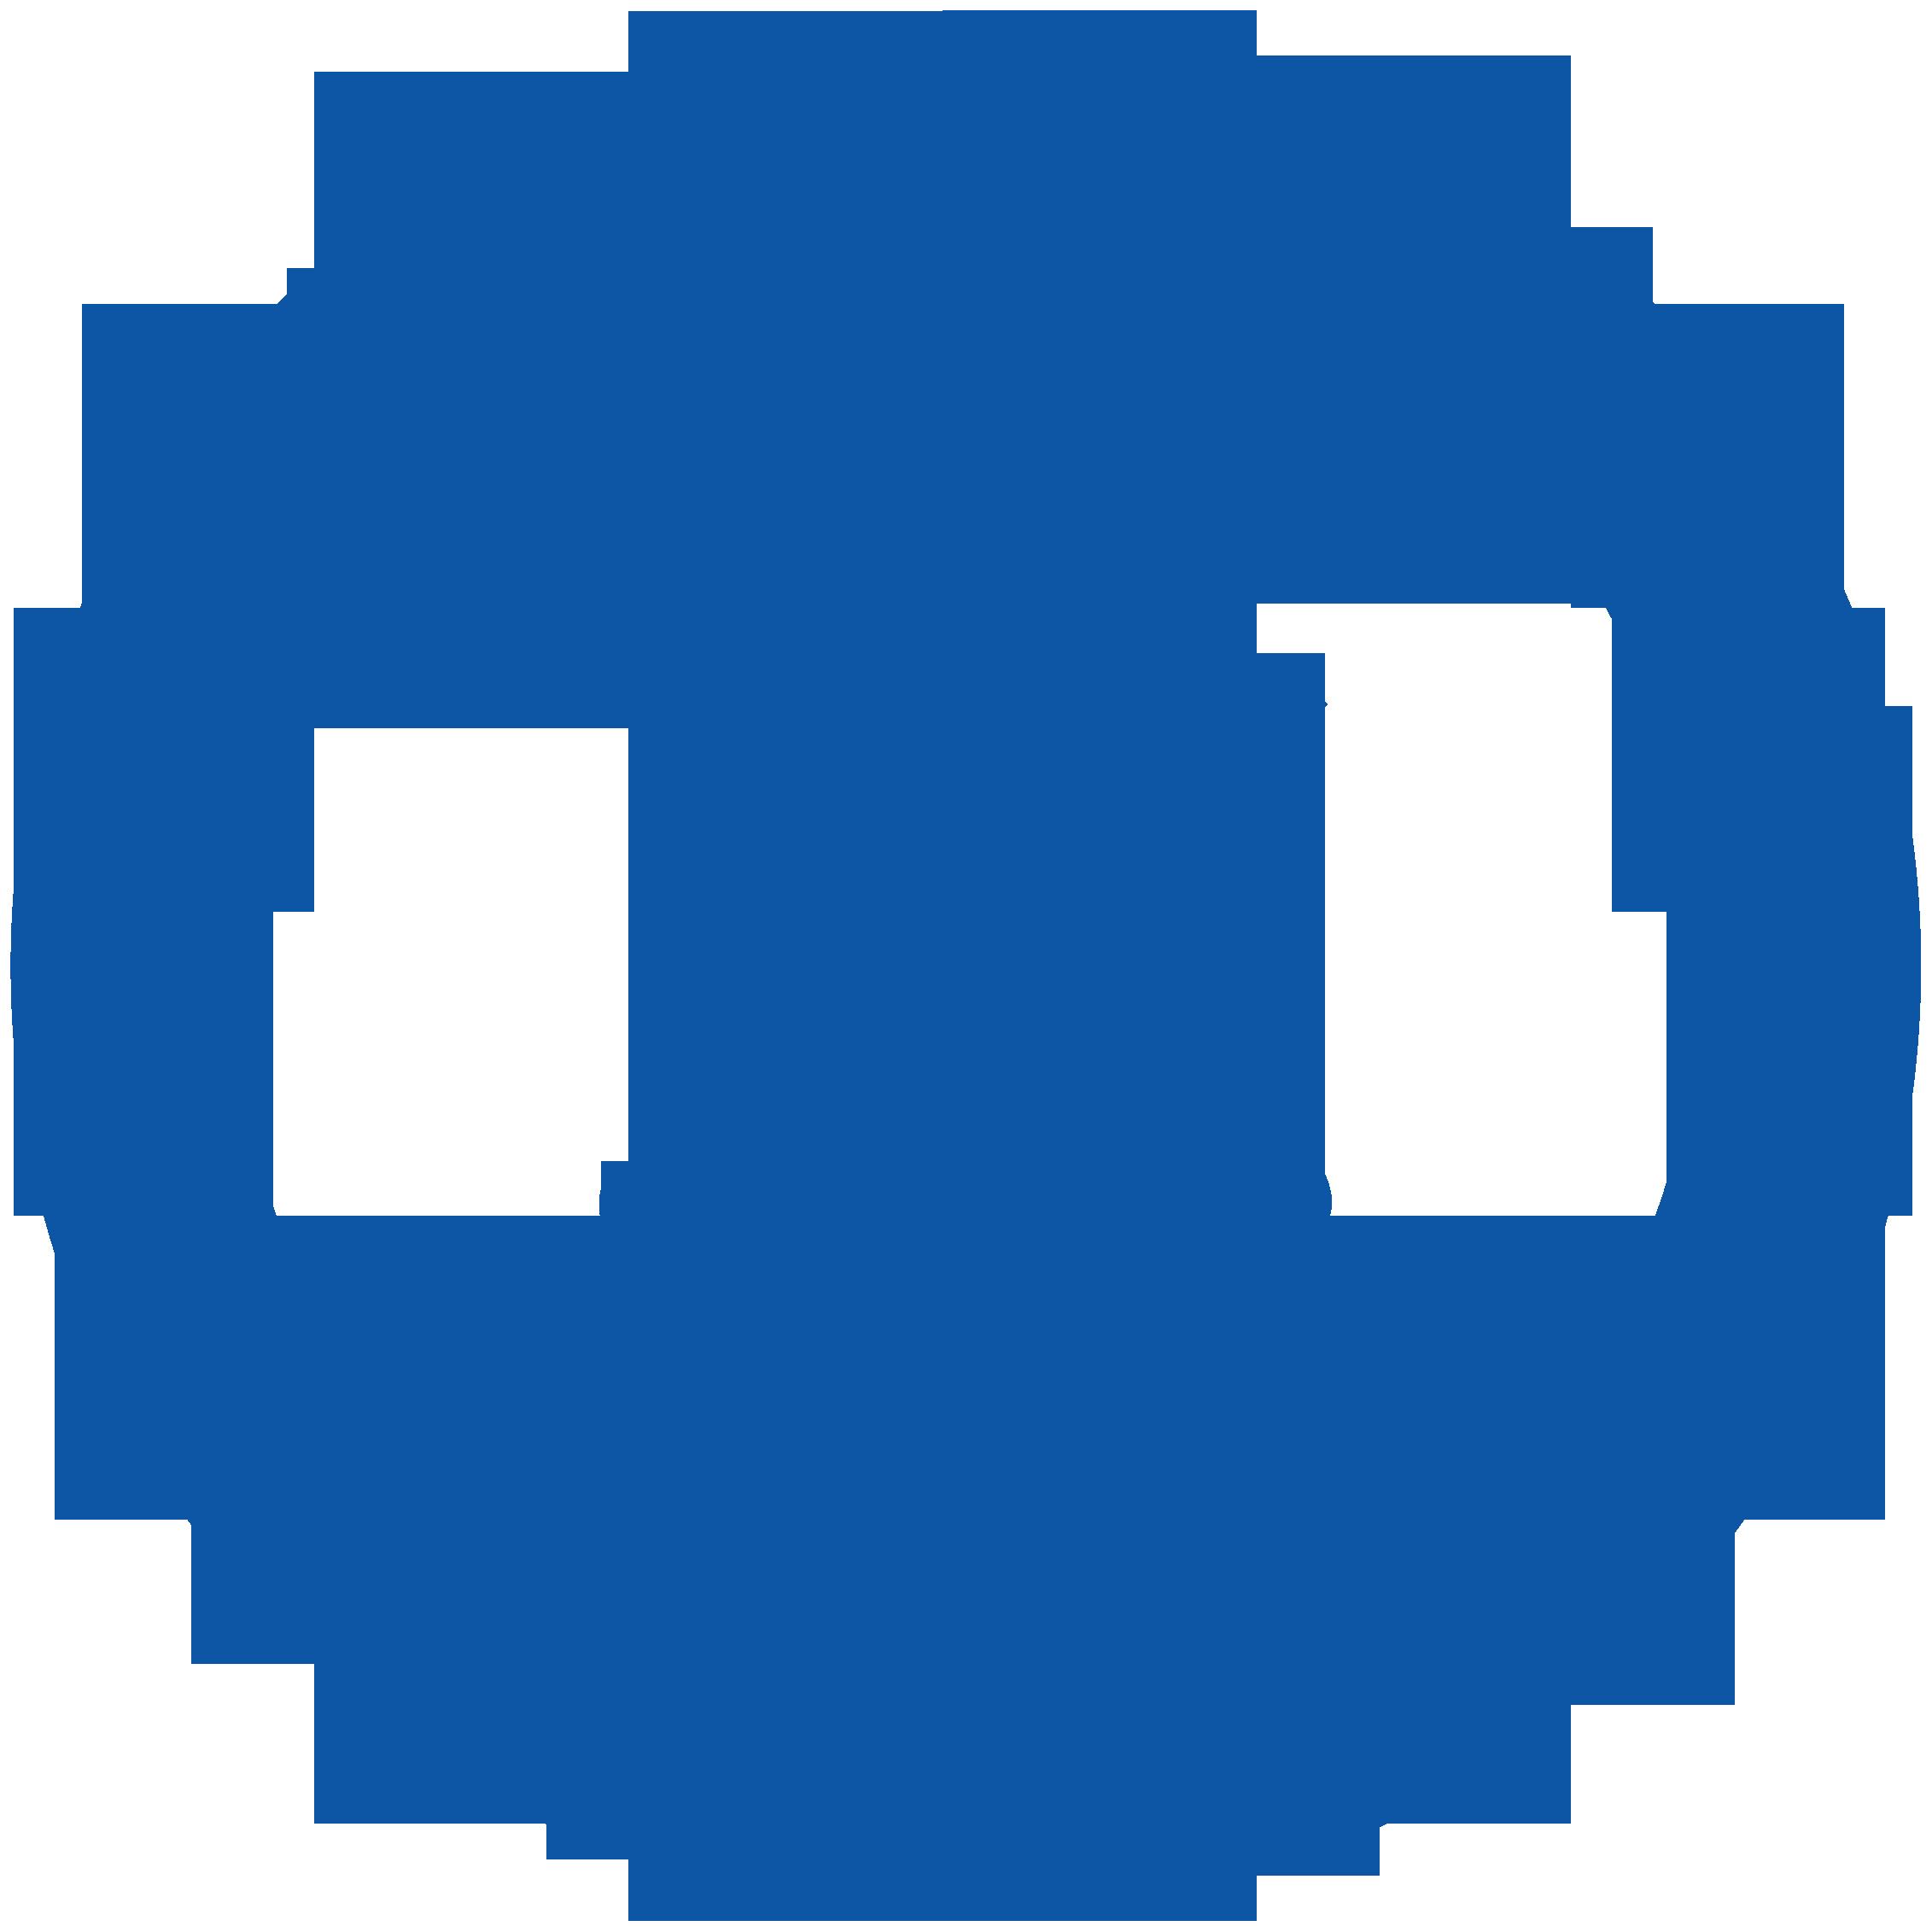 Phi Beta Sigma fraternity, Inc.